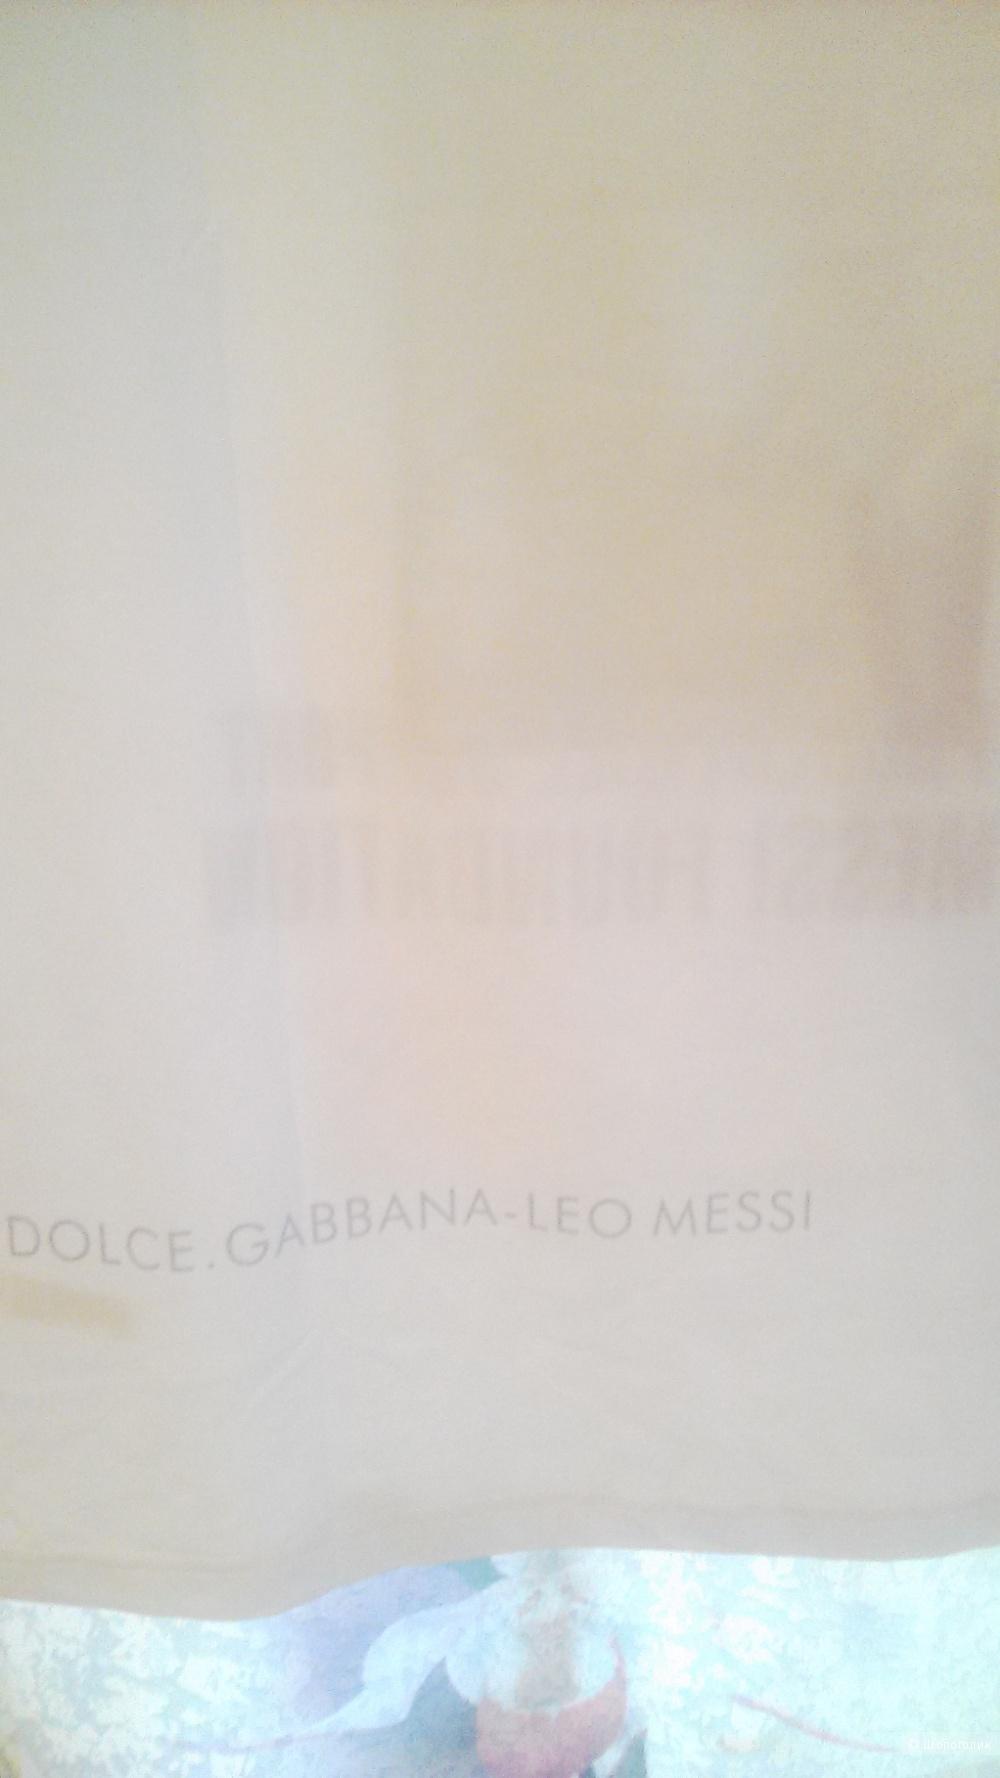 Футболка   Dolce &  Gabbana  размер  XXL.